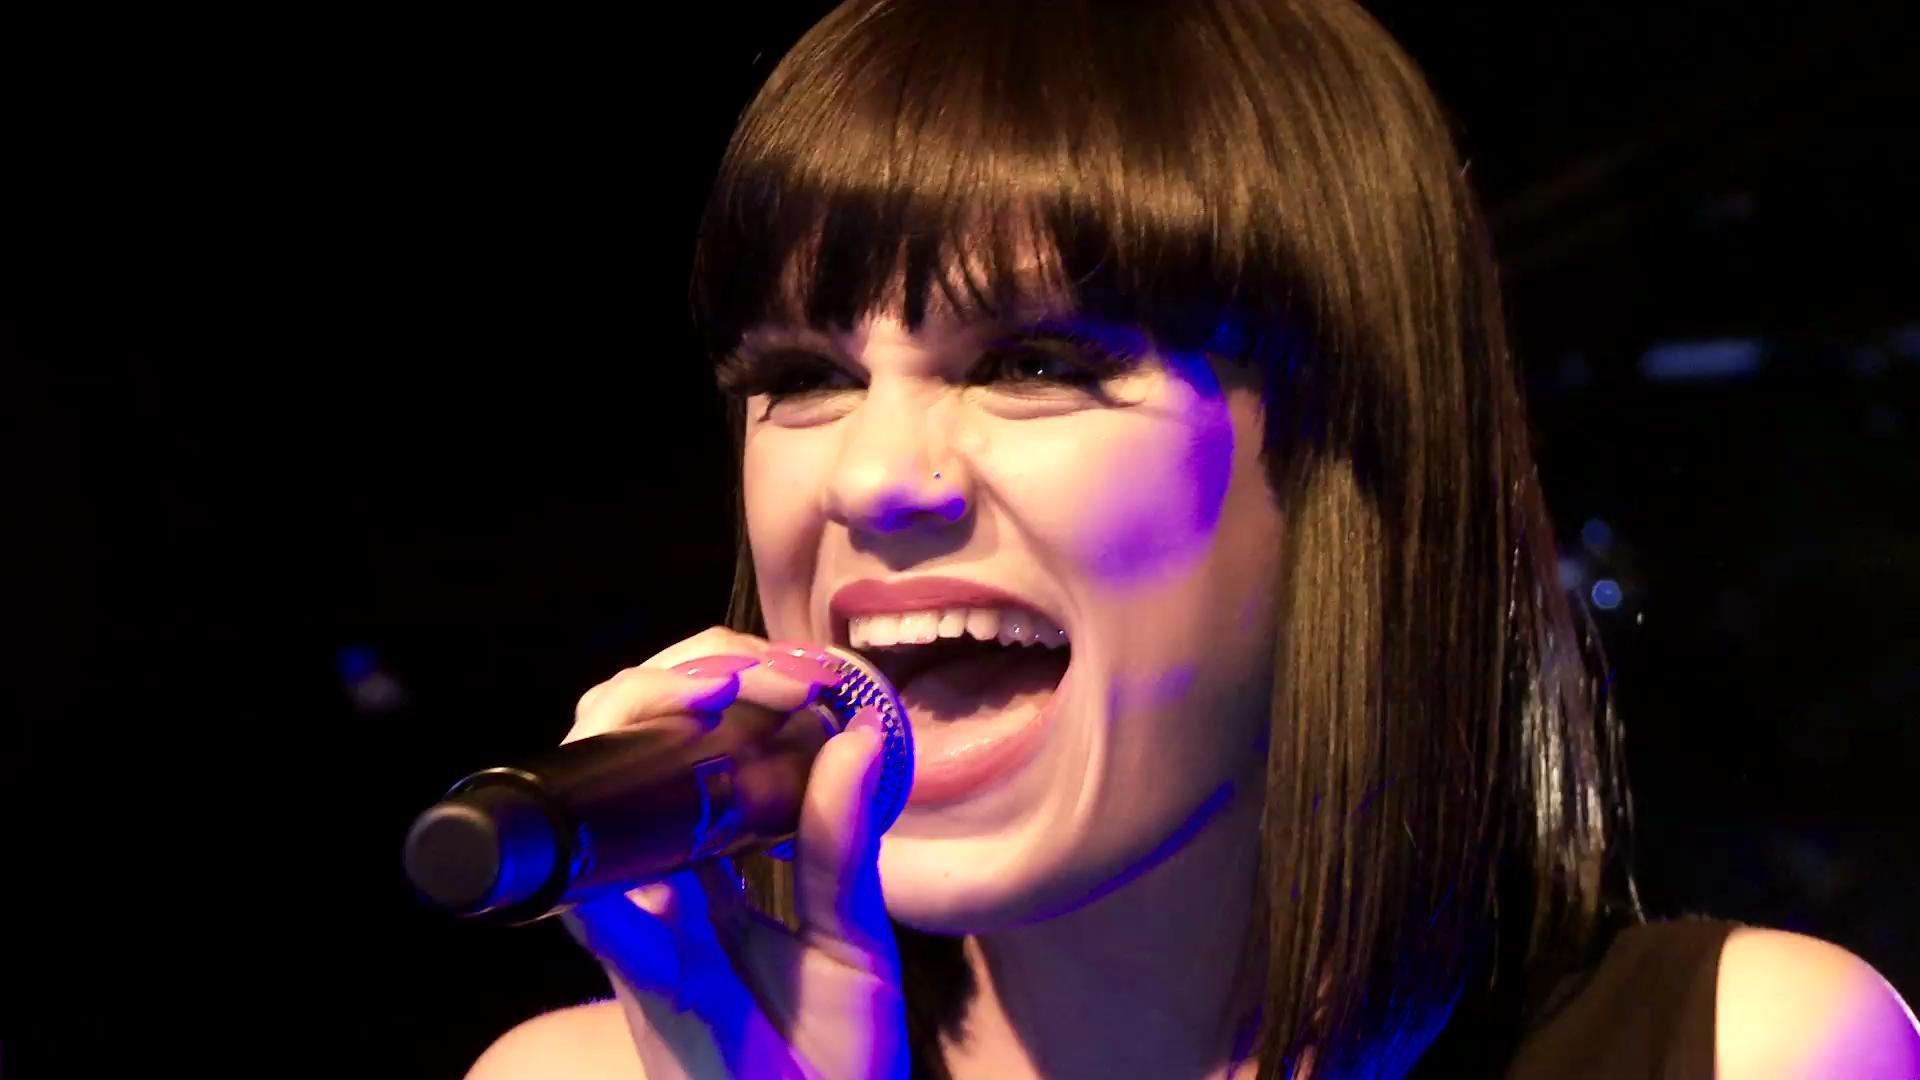 Nobody's Perfect Jessie J Lyrics